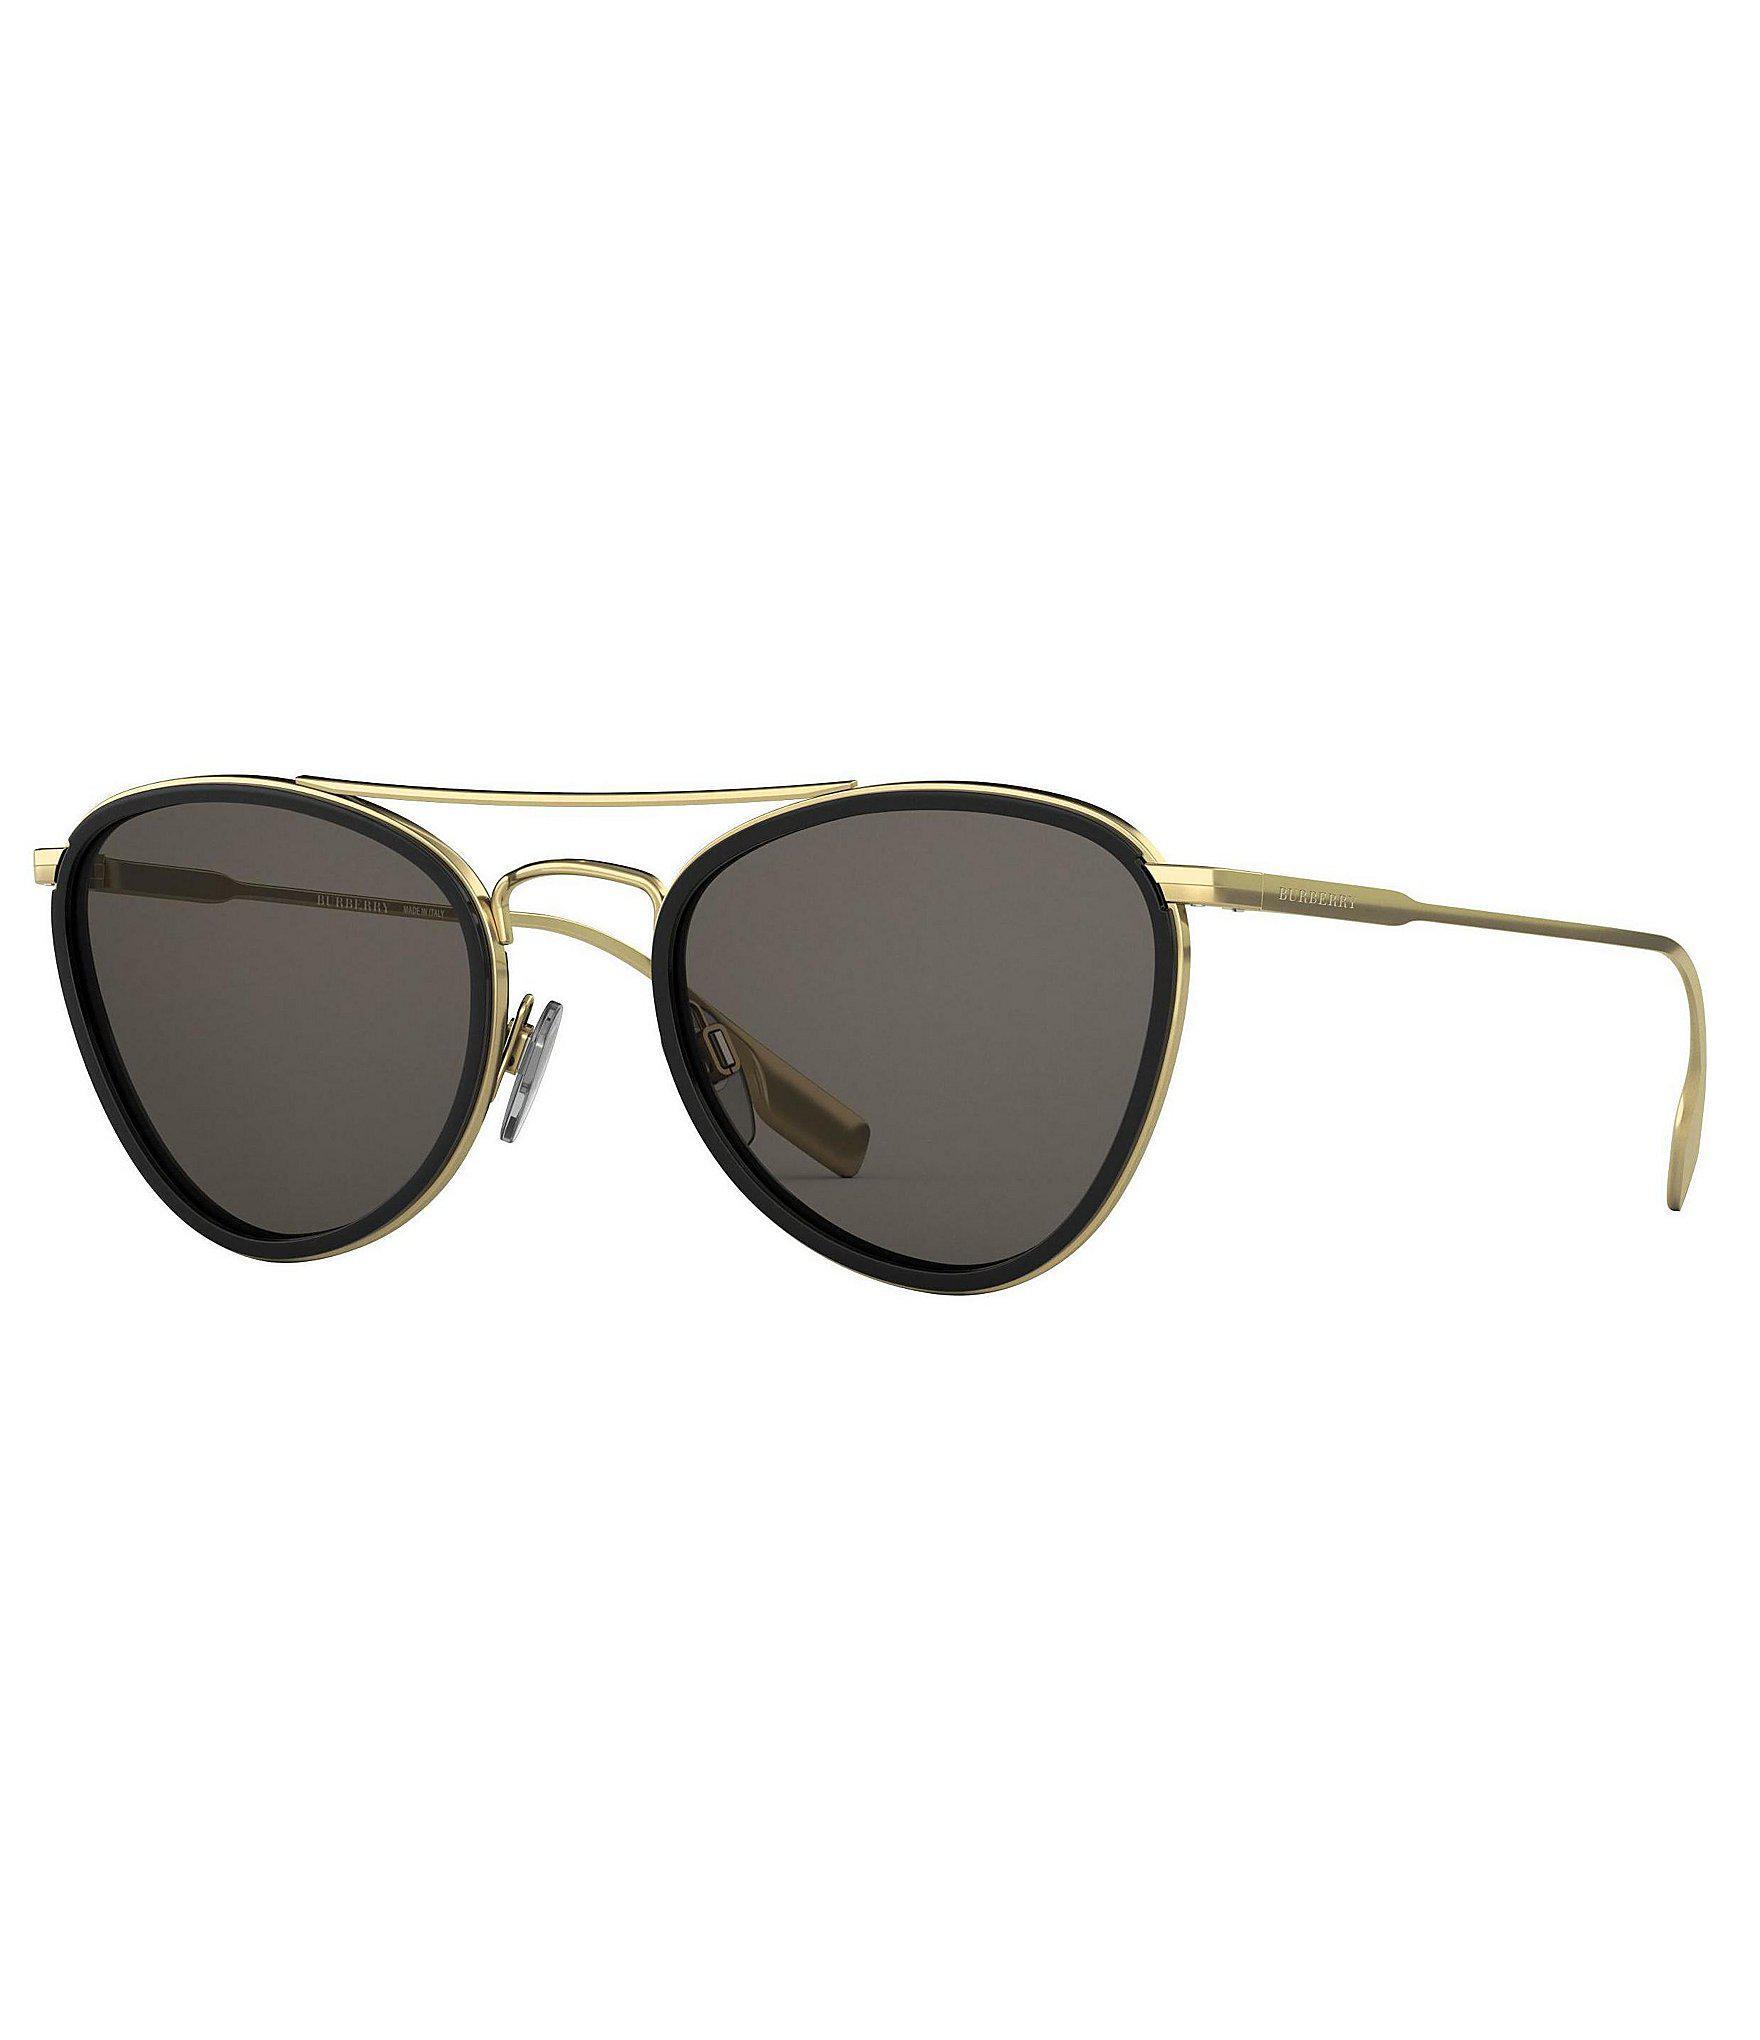 9c939100b83b Lyst - Burberry Modified Aviator Sunglasses